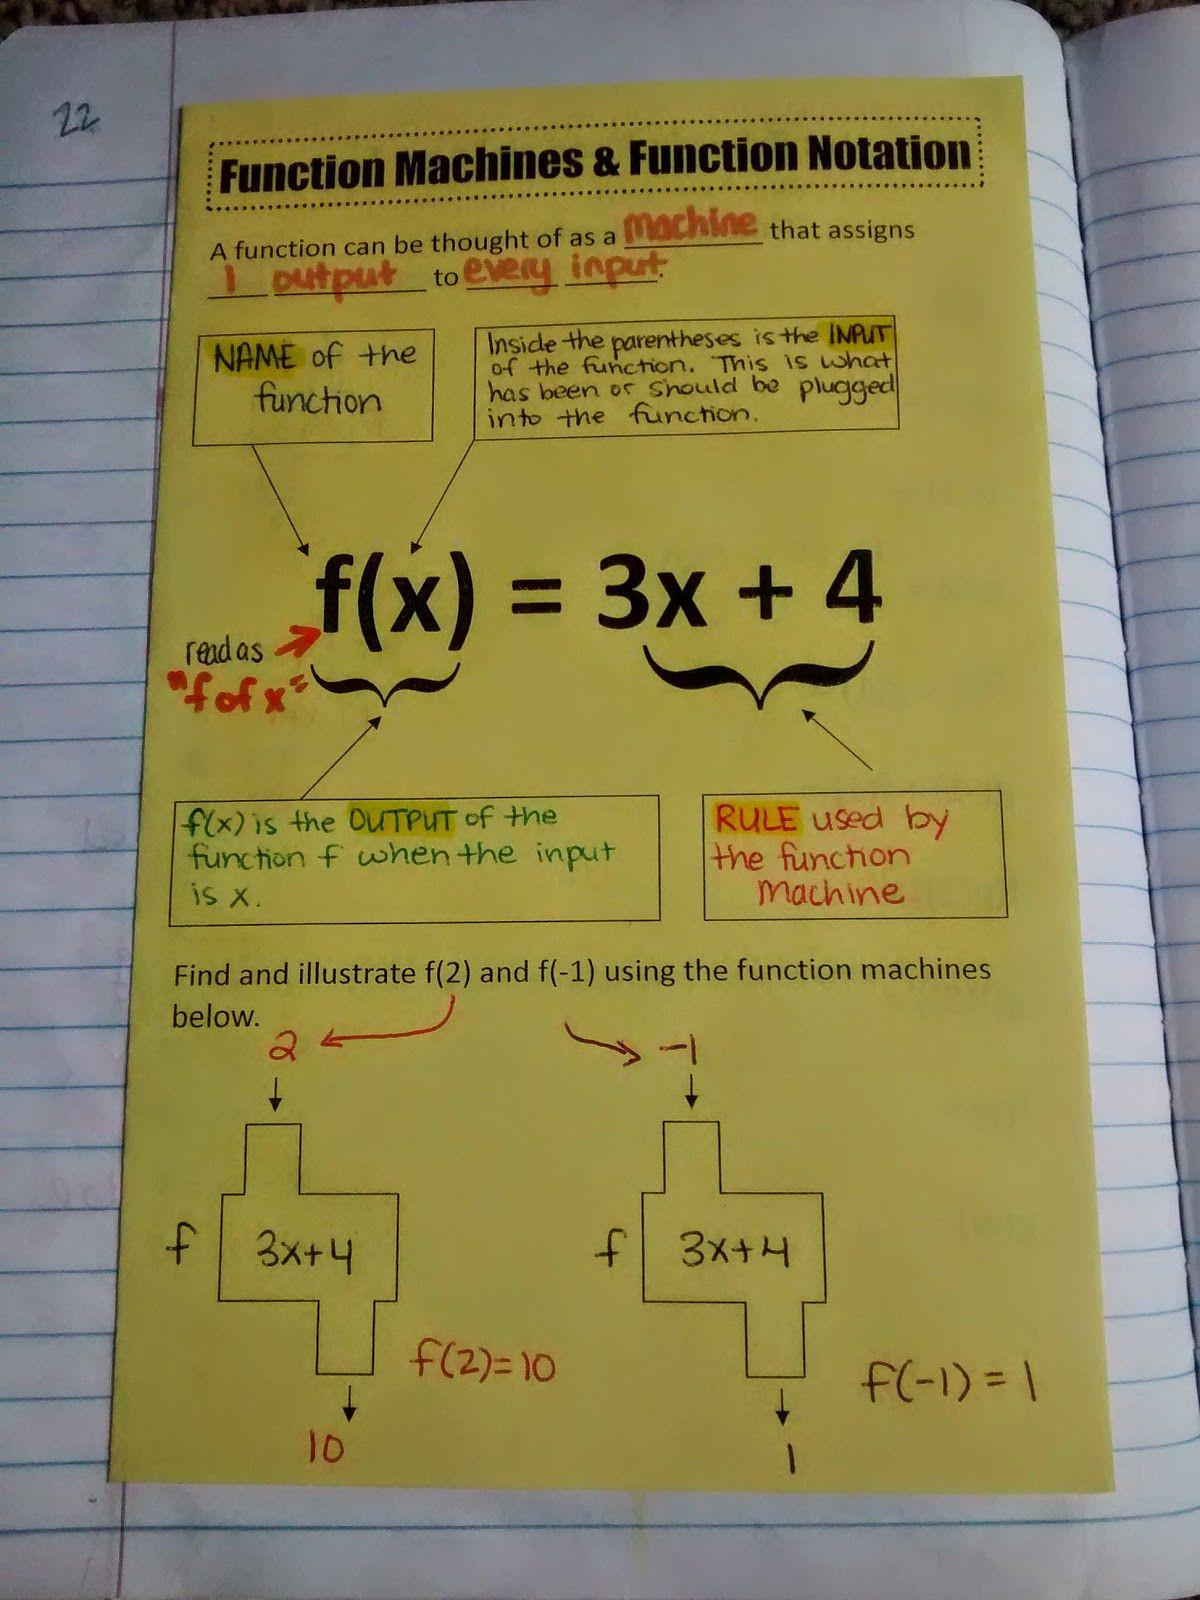 Algebra 1 Function Notation Worksheet 2014 2015 Algebra 1 Unit 1 Interactive Notebook Pages